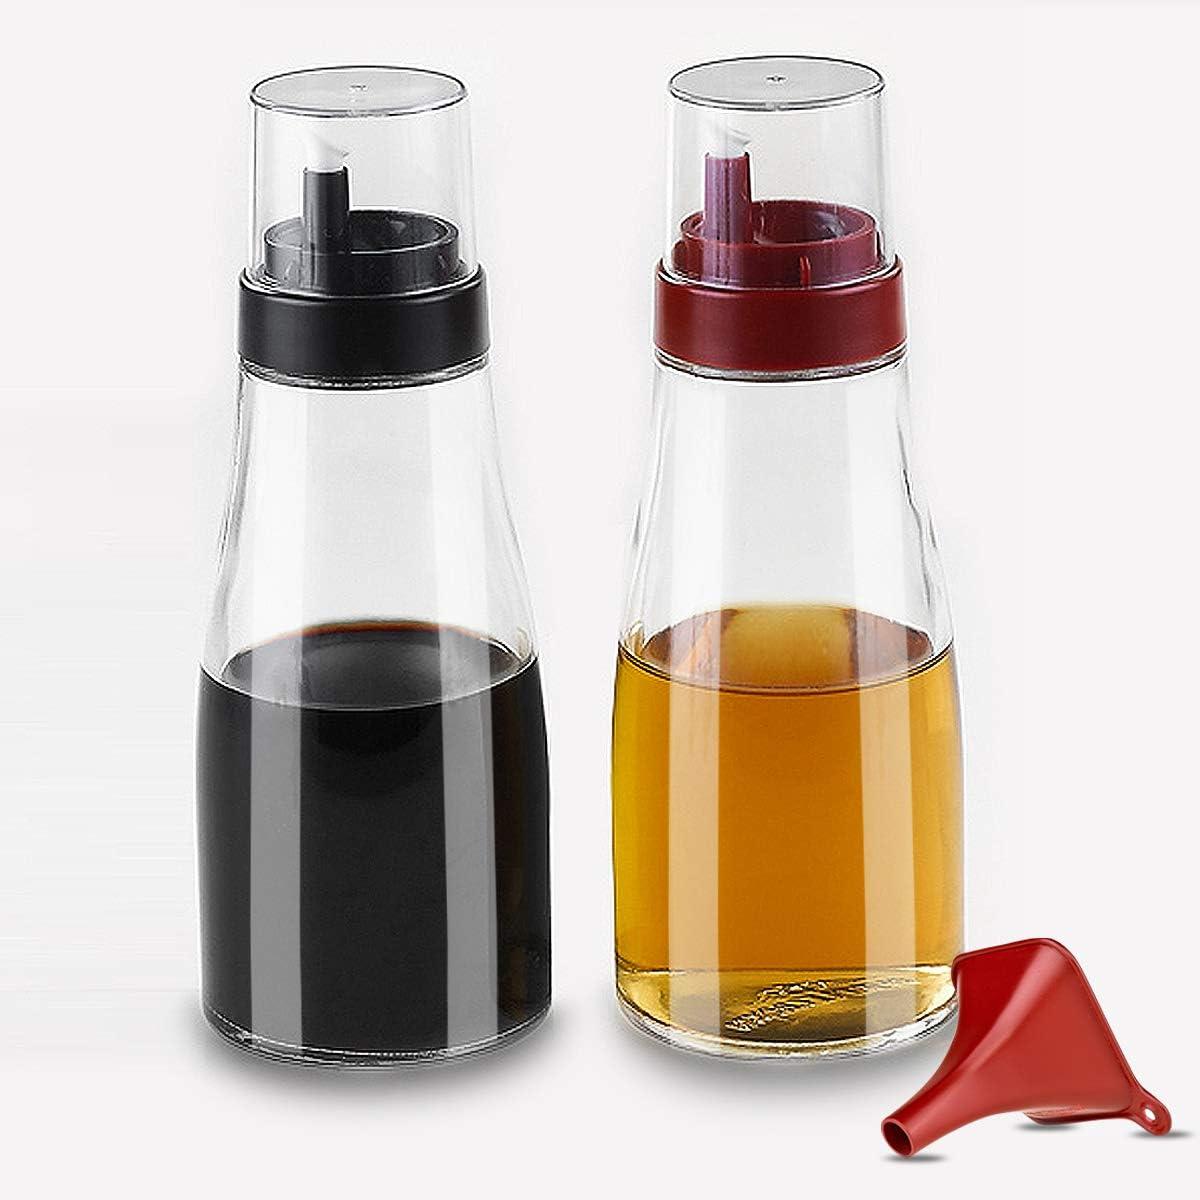 PURPLECROWN 11oz Glass Olive Oil & Vinegar Dispenser set, Leakproof Oil Decanter Condiment Container Cruet, Non-Drip Spout Seasoning bottle For Kitchen (Black+Red) (2PC)